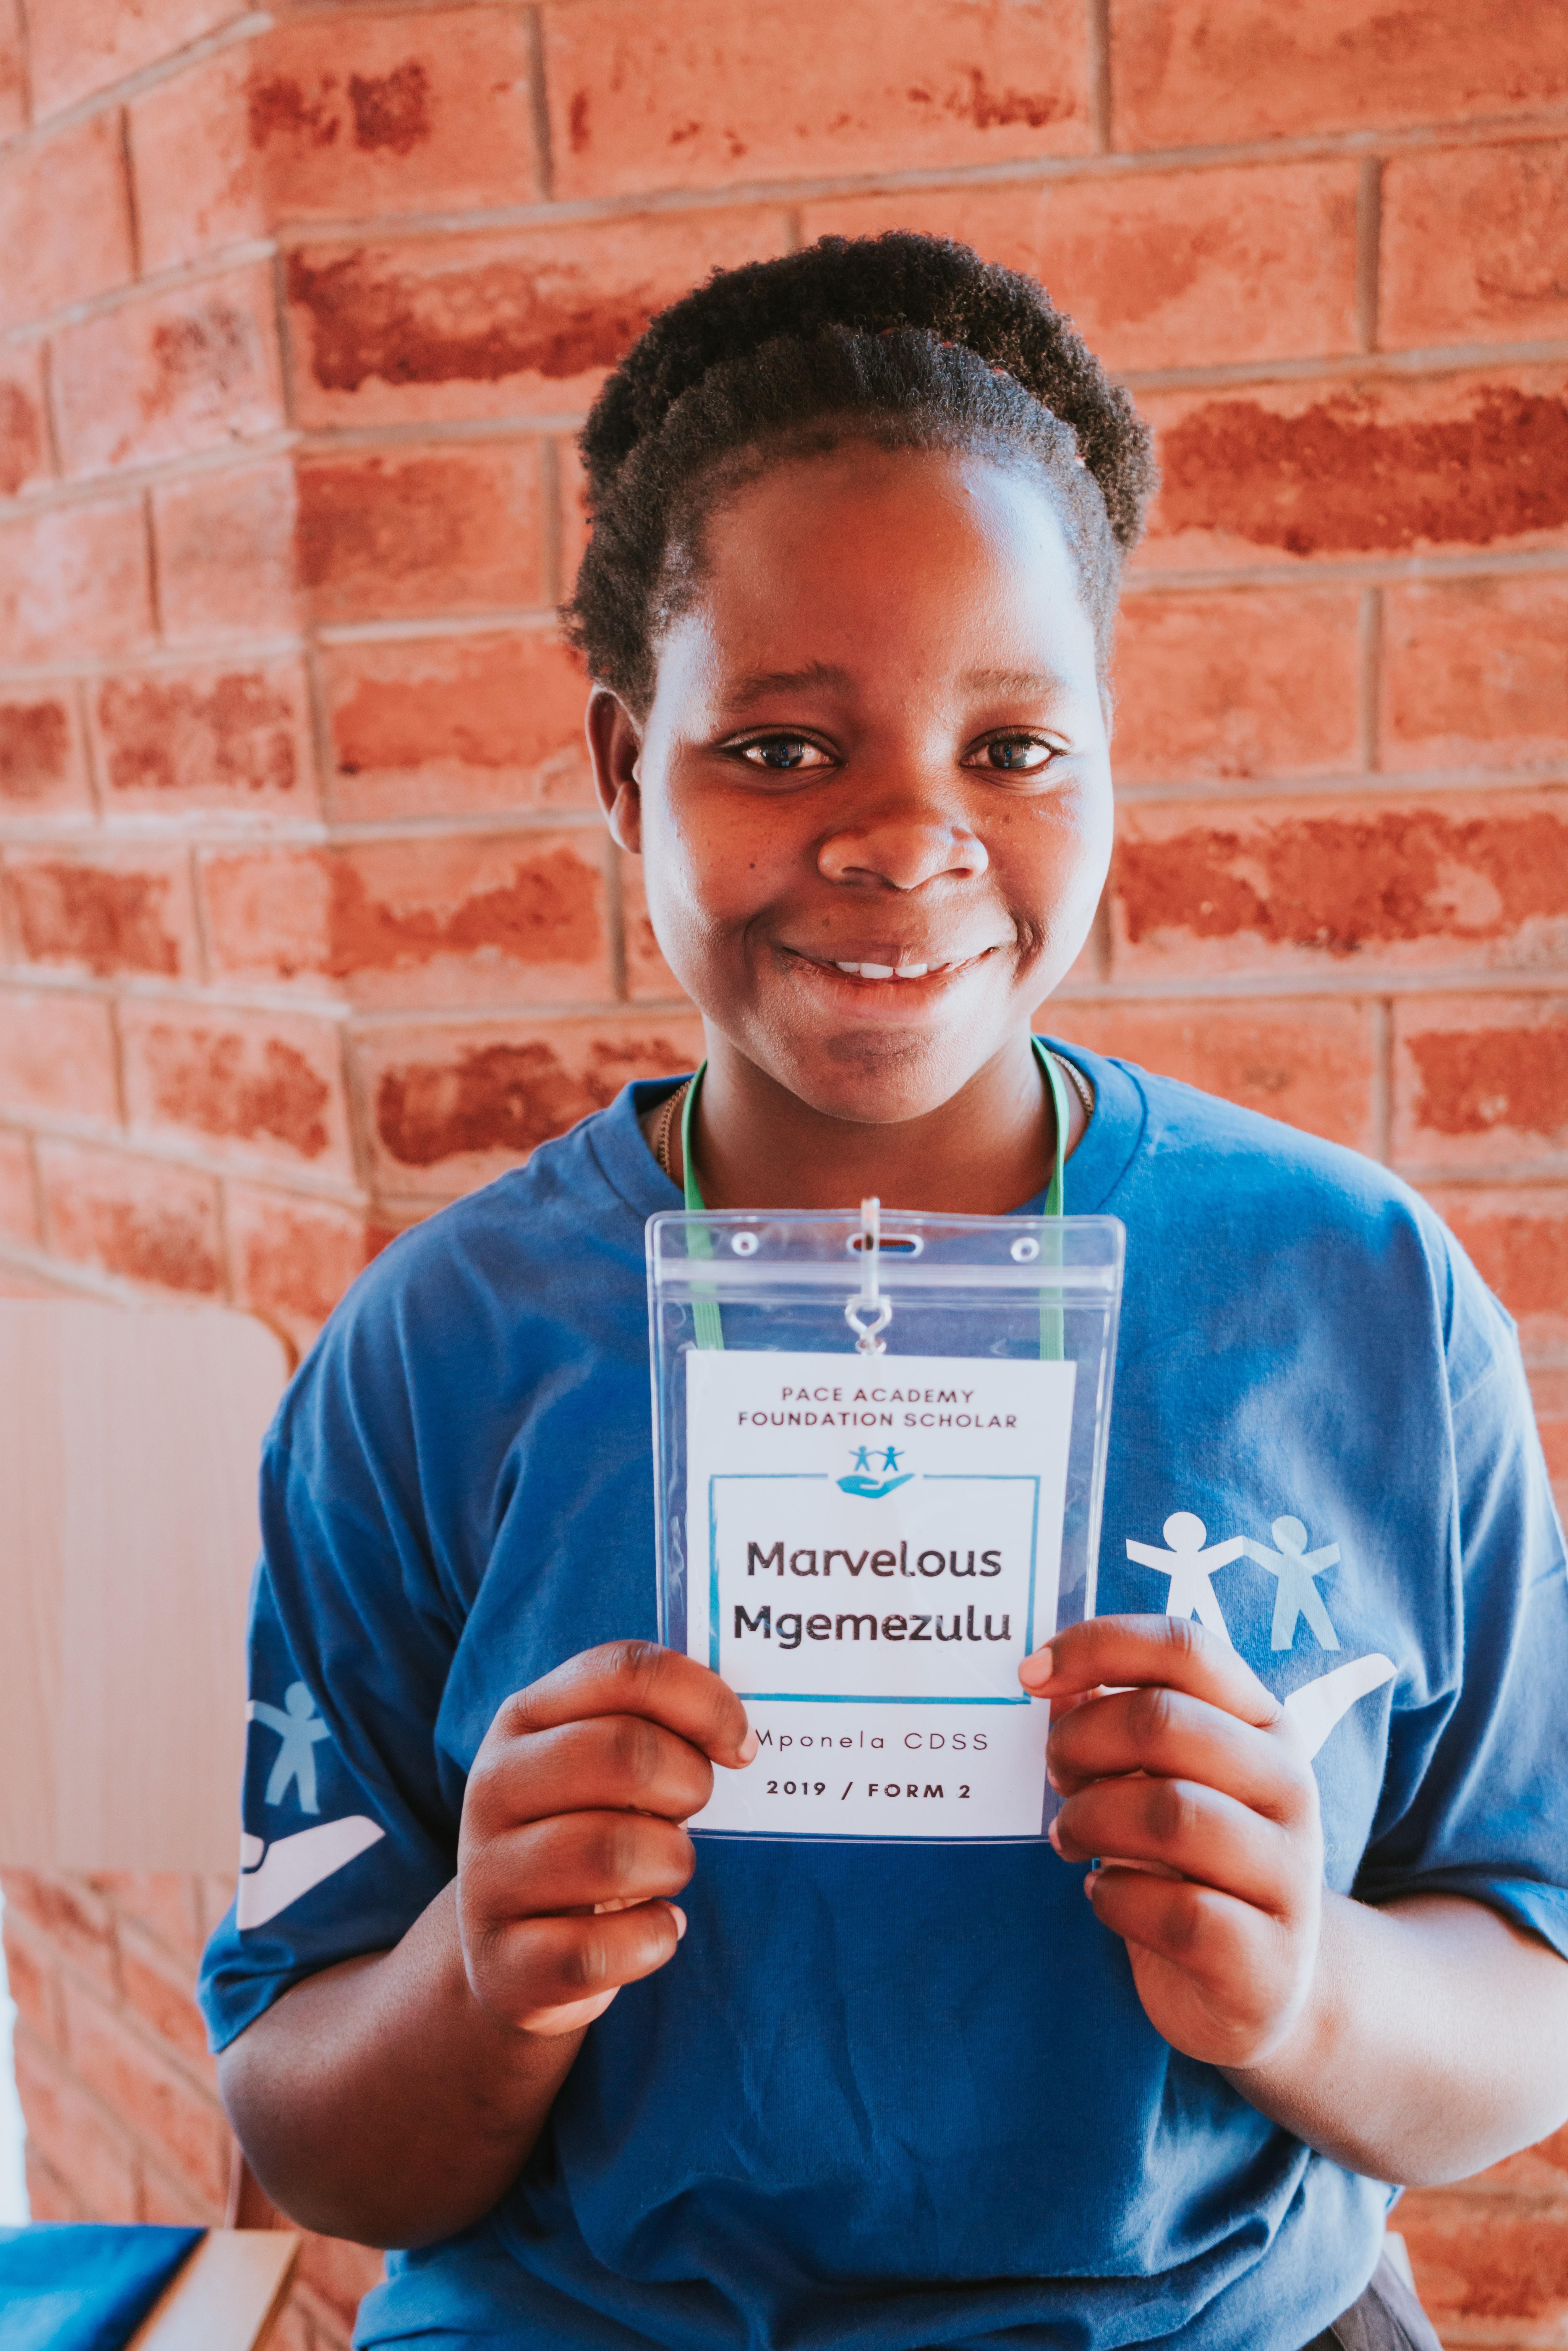 Marvelous Mgemezulu (Mponela CDSS)